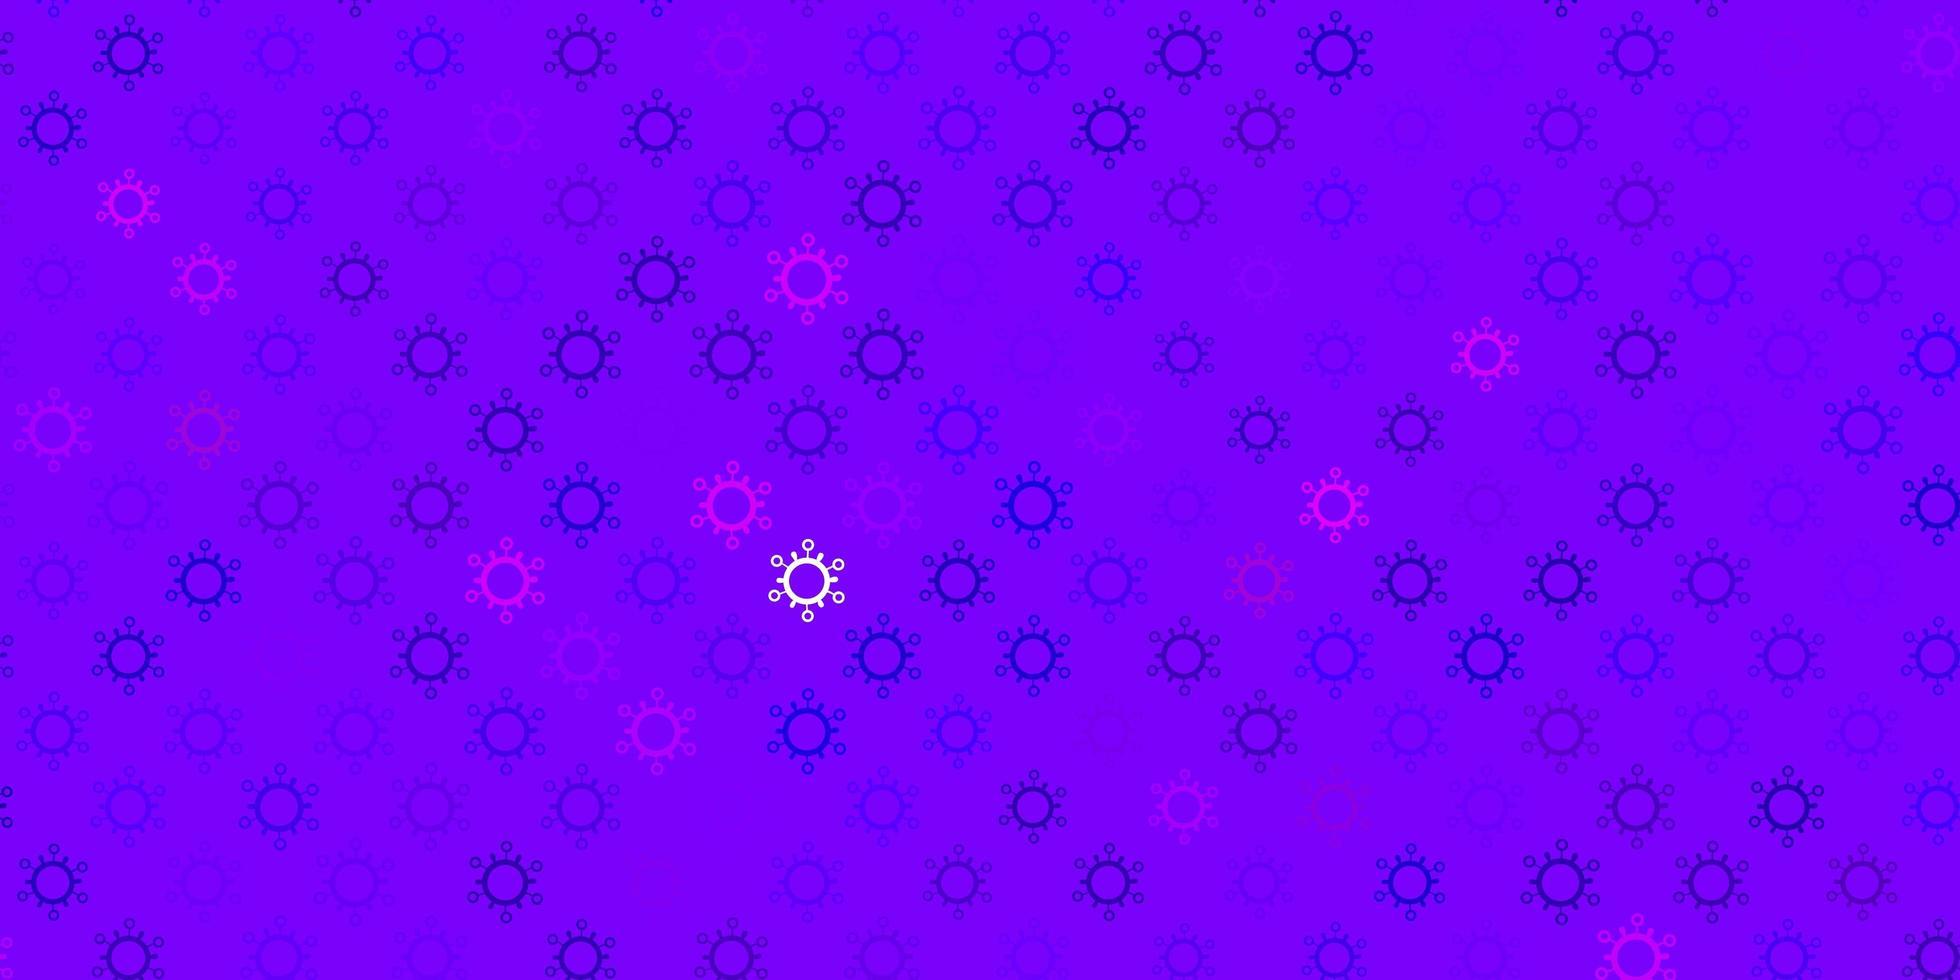 dunkelvioletter, rosa Vektorhintergrund mit covid-19 Symbolen vektor